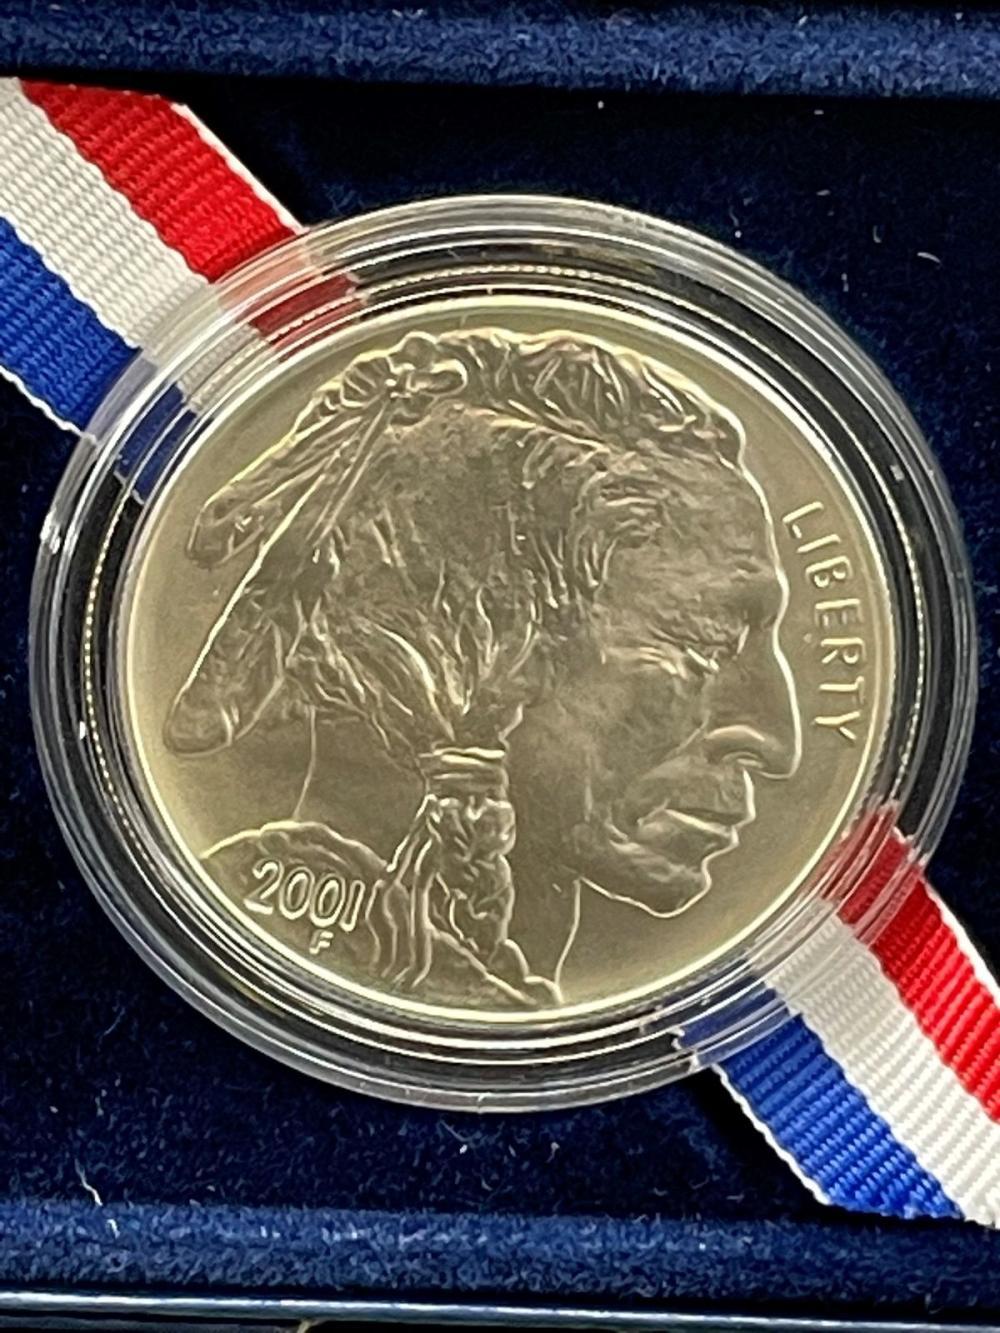 2001-D American Buffalo Commemorative Uncirculated Silver Dollar